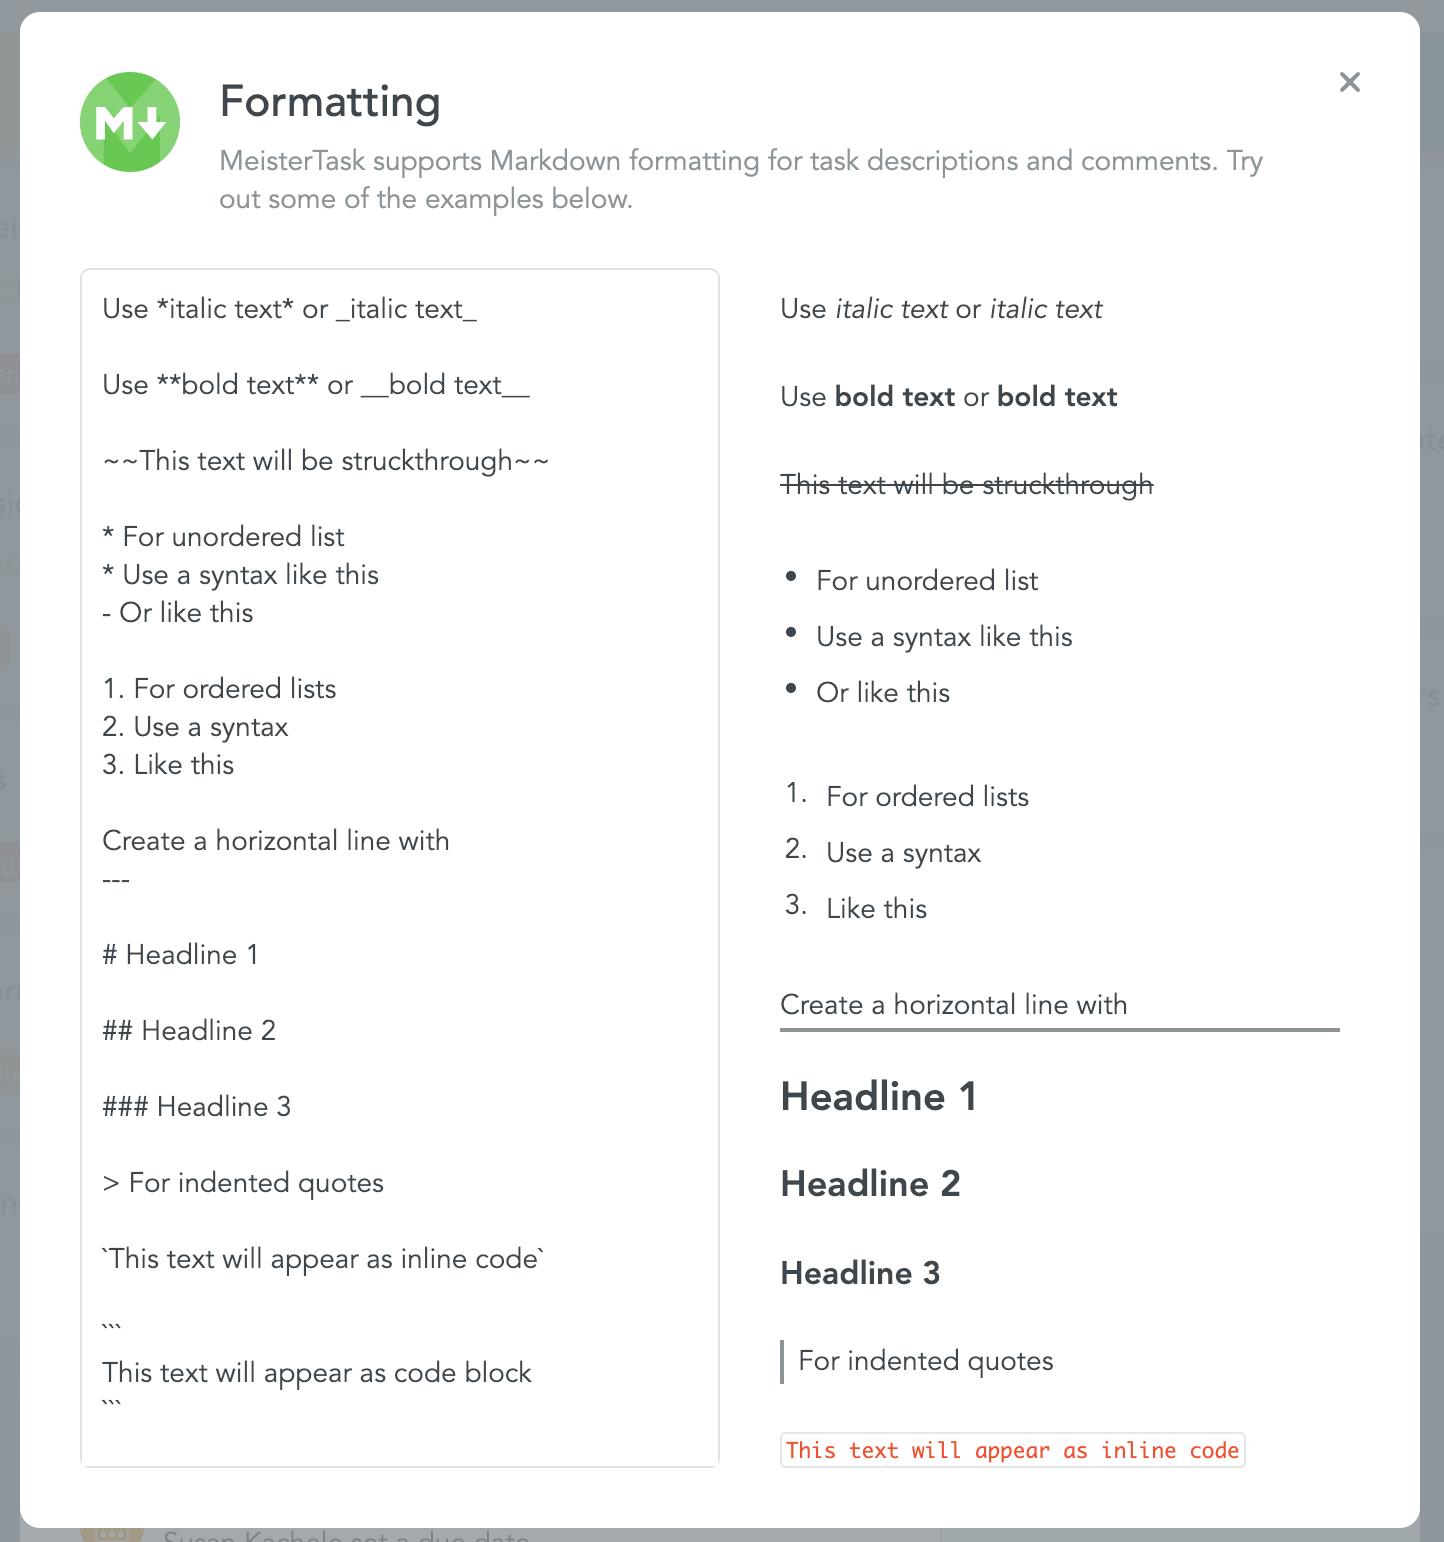 Markdown formatting